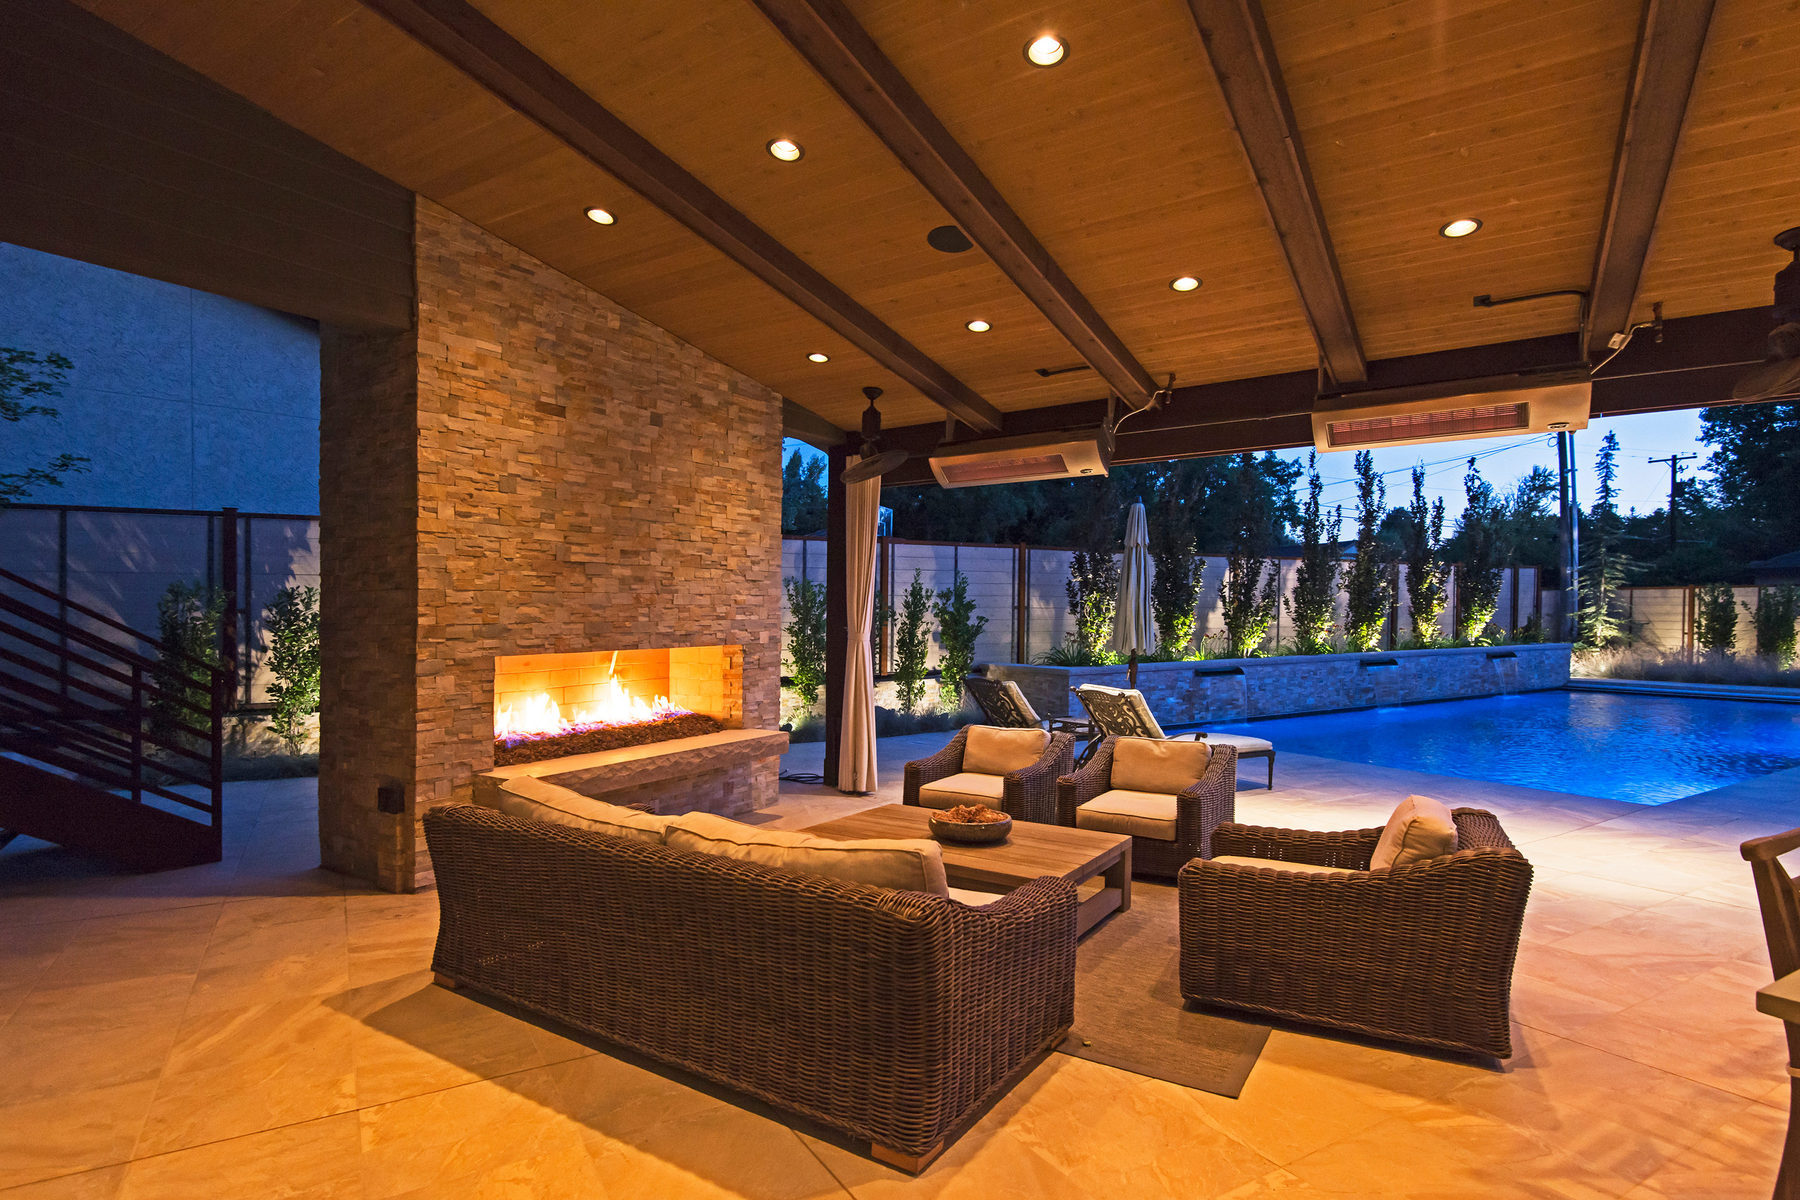 Moradia para Venda às Elegant, Resort-Style Willowcreek Home 2700 E Robidoux Rd Sandy, Utah 84093 Estados Unidos